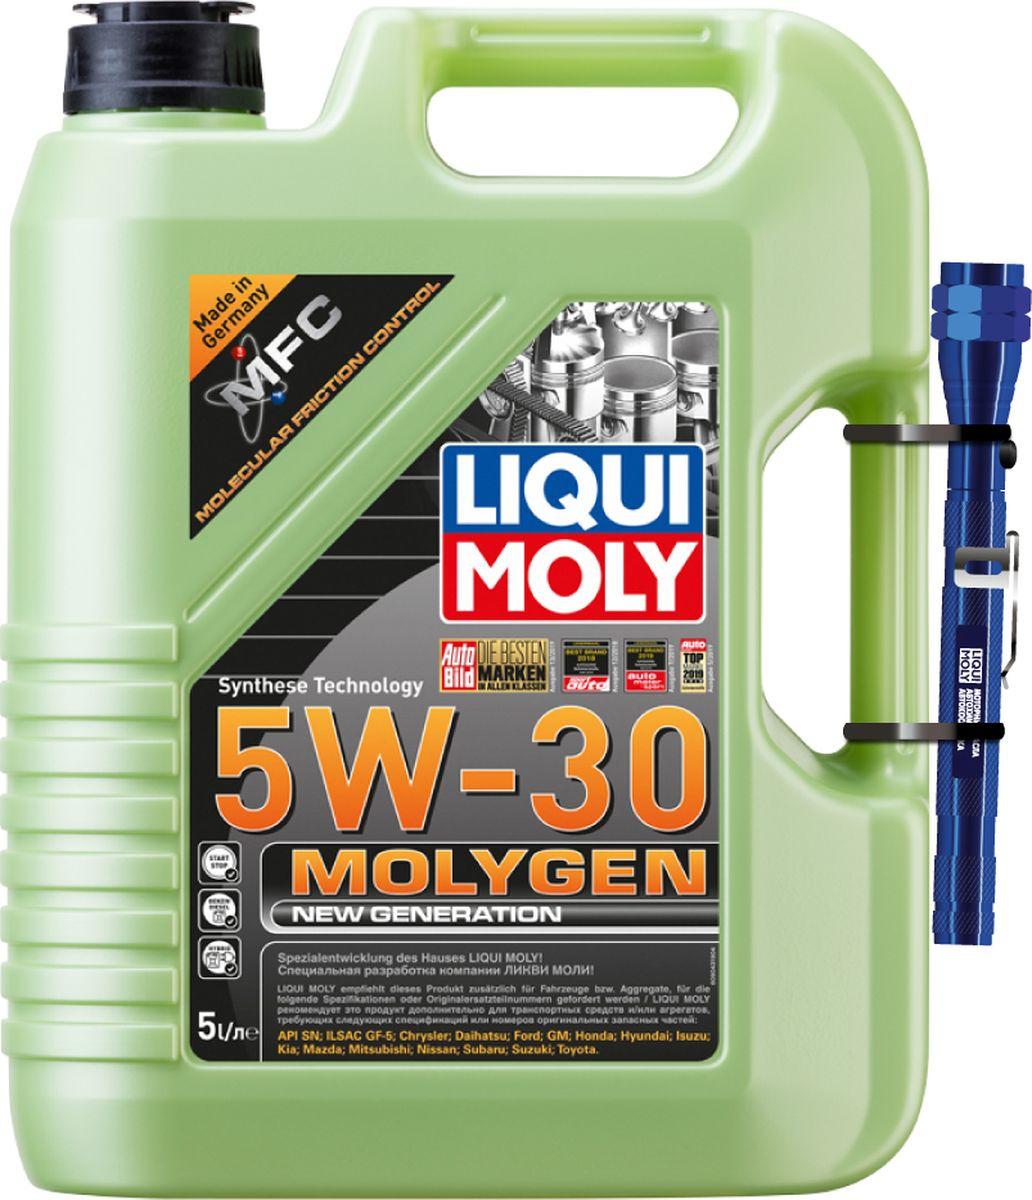 Моторное масло Liqui Moly Molygen New Generation, НС-синтетическое, 5W-30, 5 л + Фонарик в подарок 9042d liquimoly нс синт мот масло molygen new generation 5w 30 4л фонарик арт 7520r